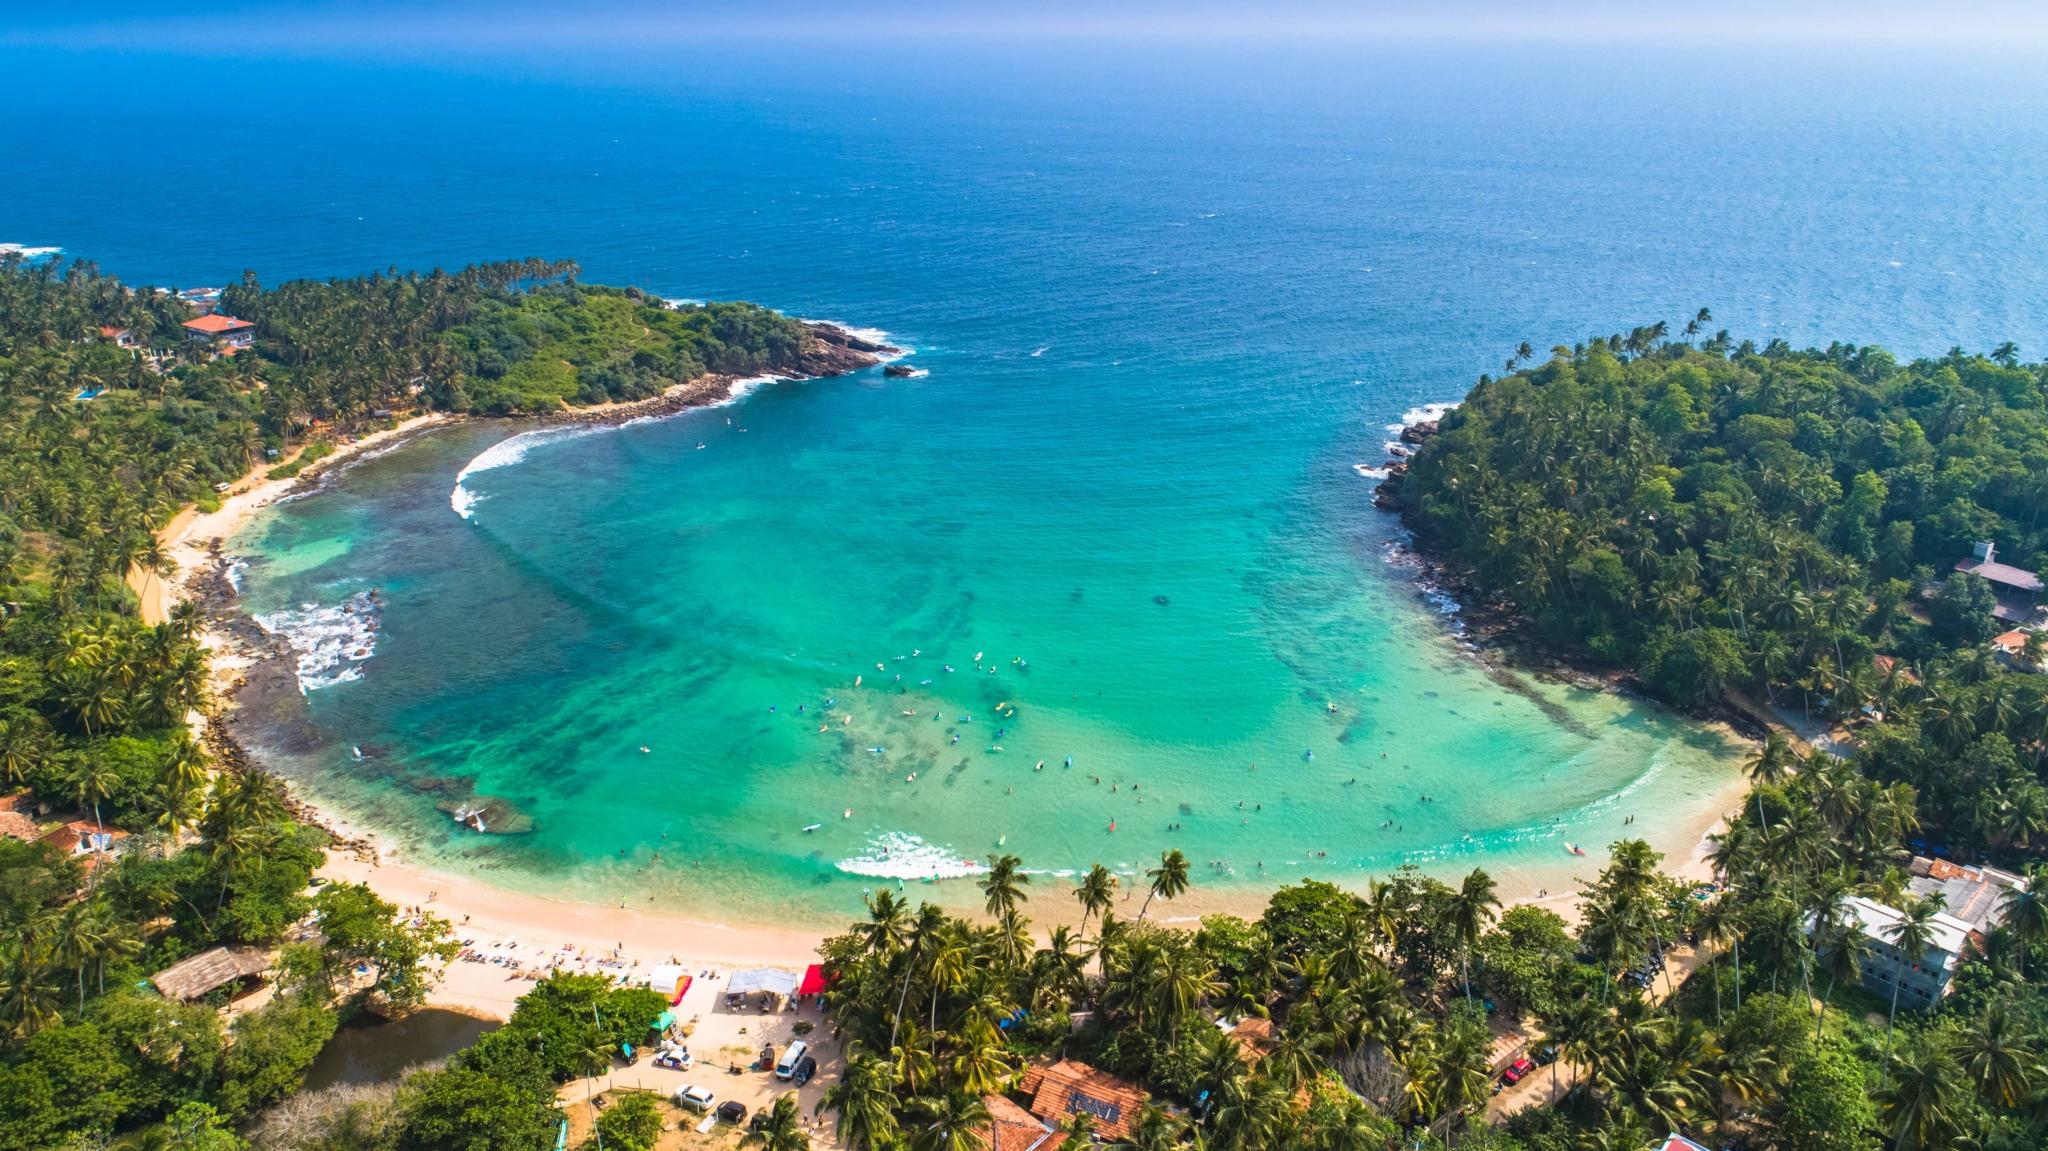 Hiriketiya - Surfing in Sri Lanka